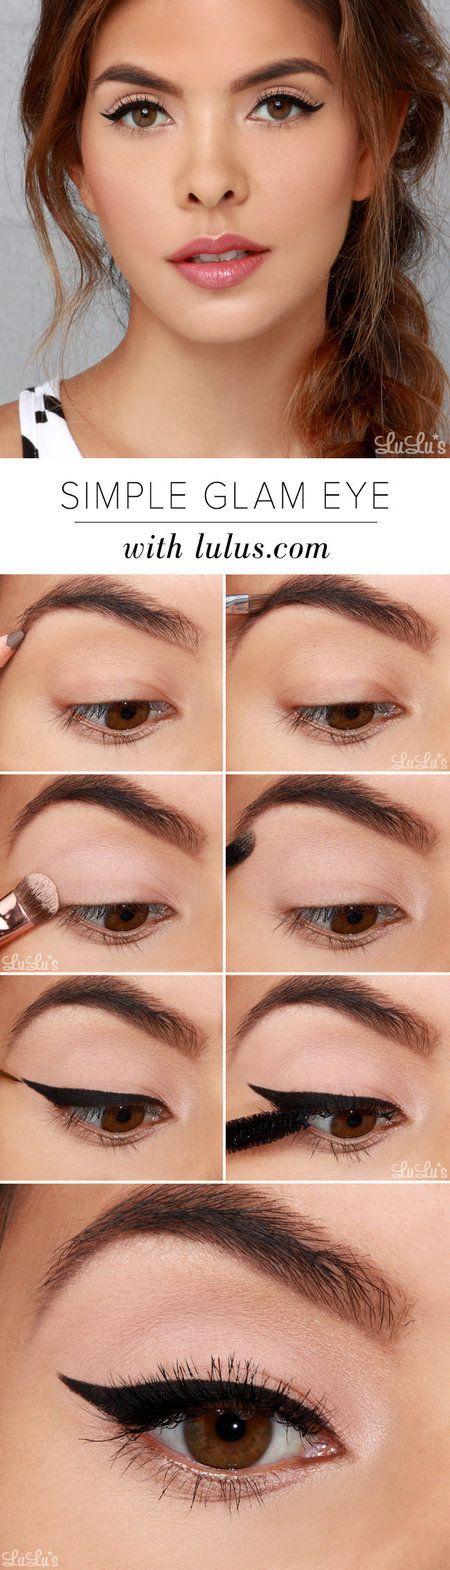 Simple Glam Eye